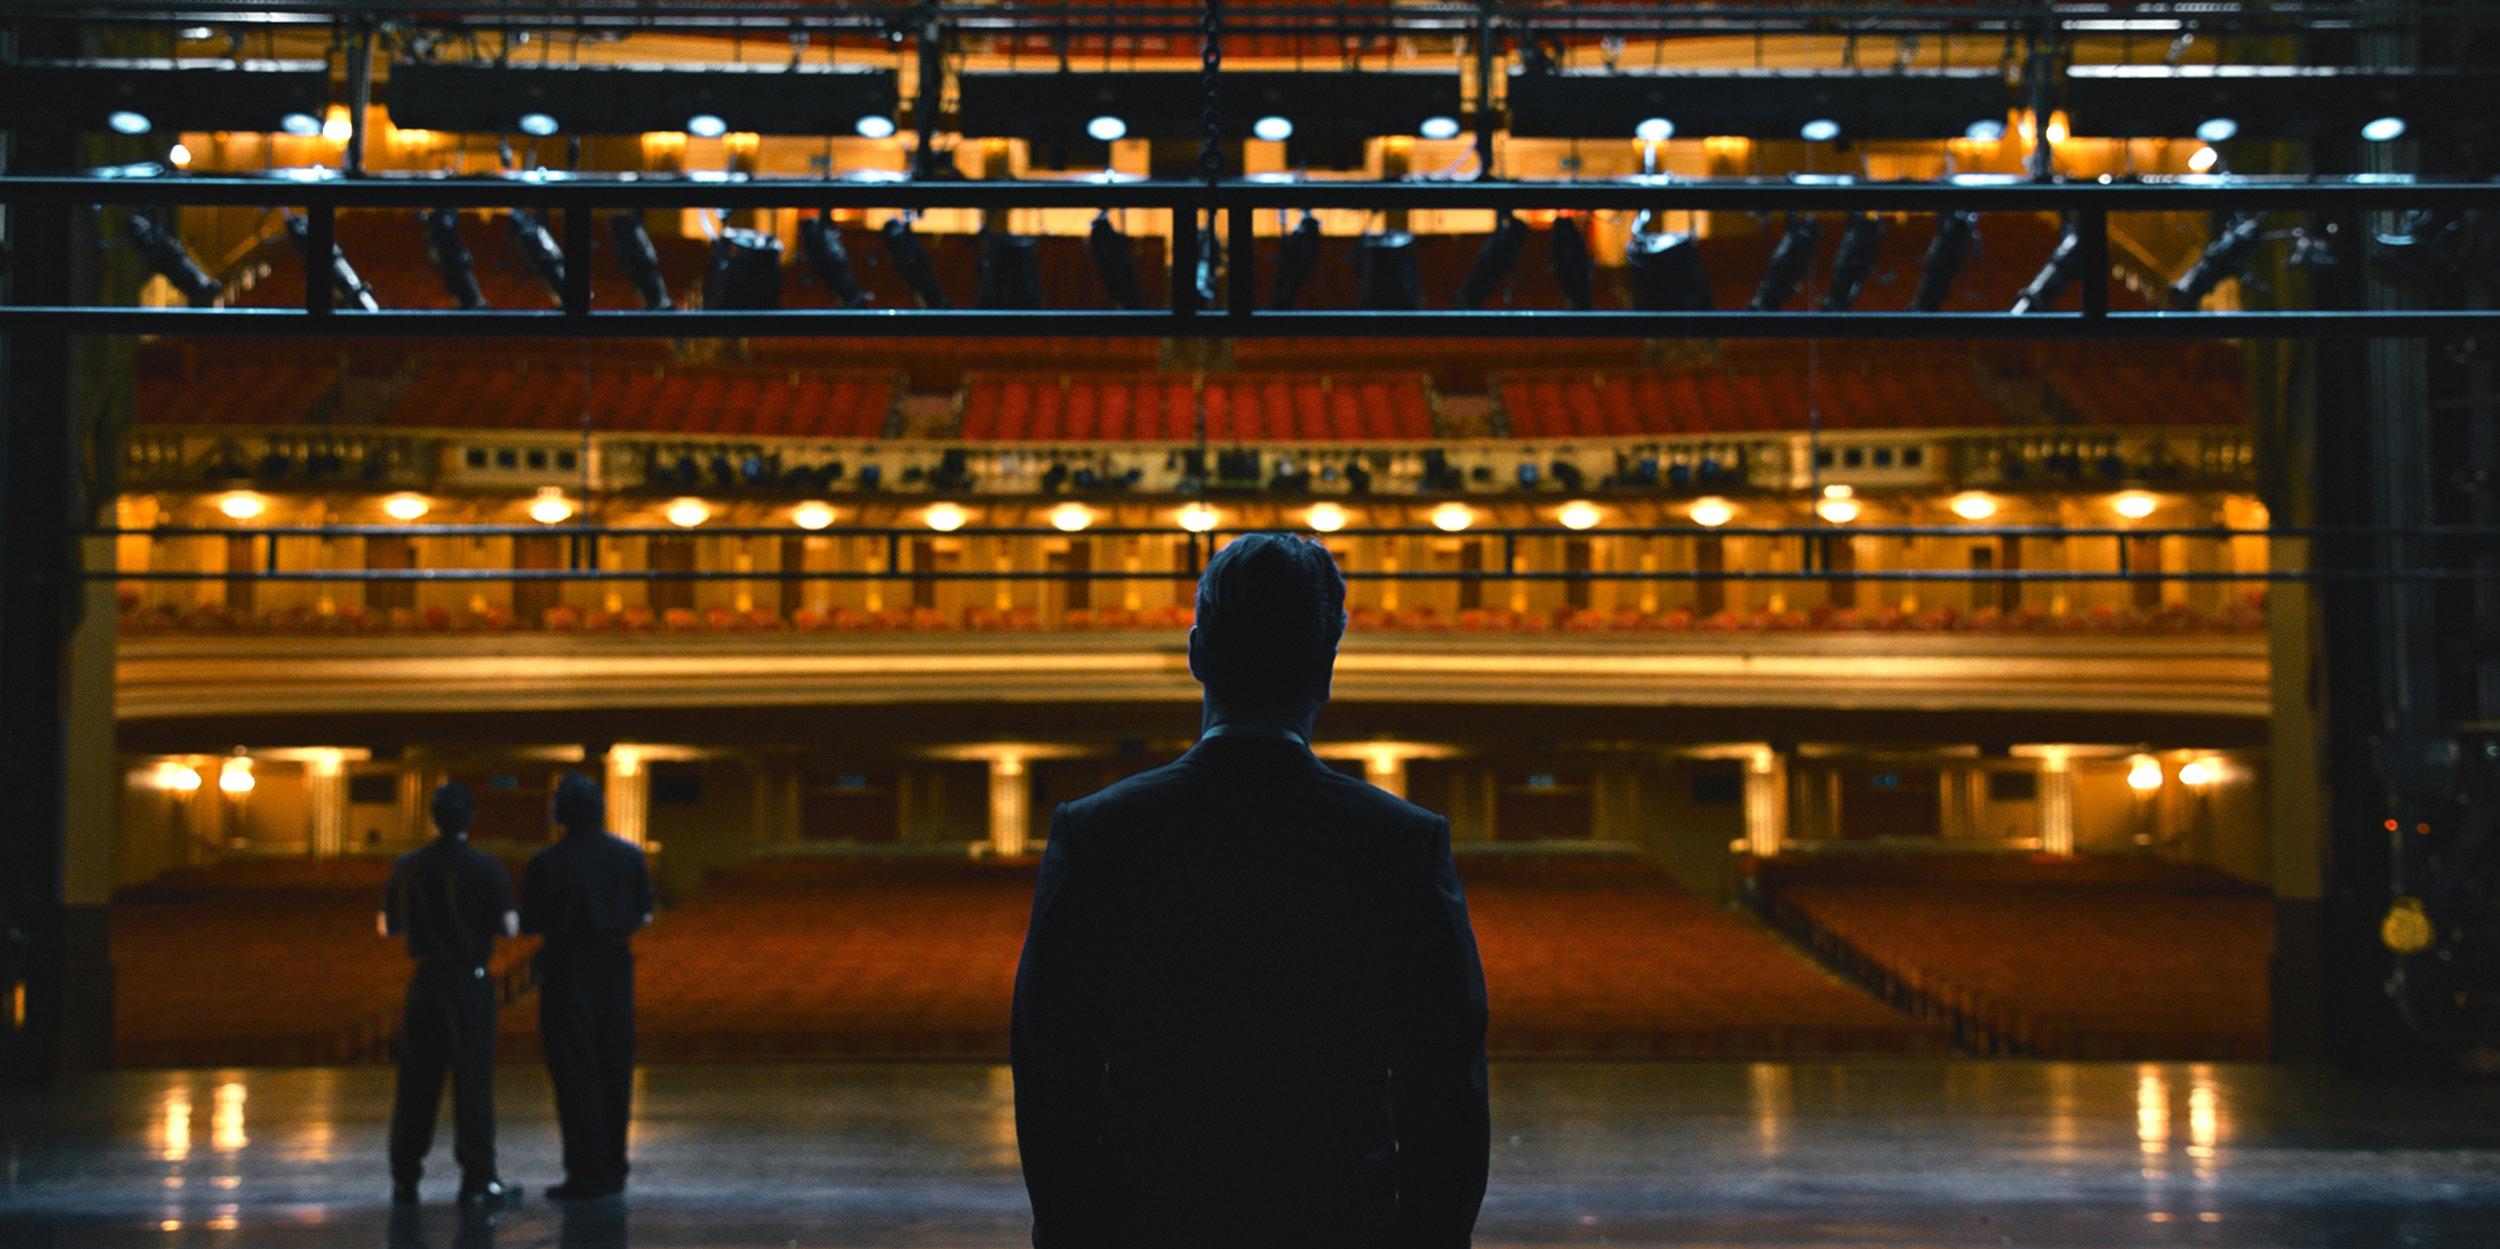 Steve Jobs (2015) - Directed by: Danny BoyleWritten by: Aaron Sorkin & Walter Isaacson (book).